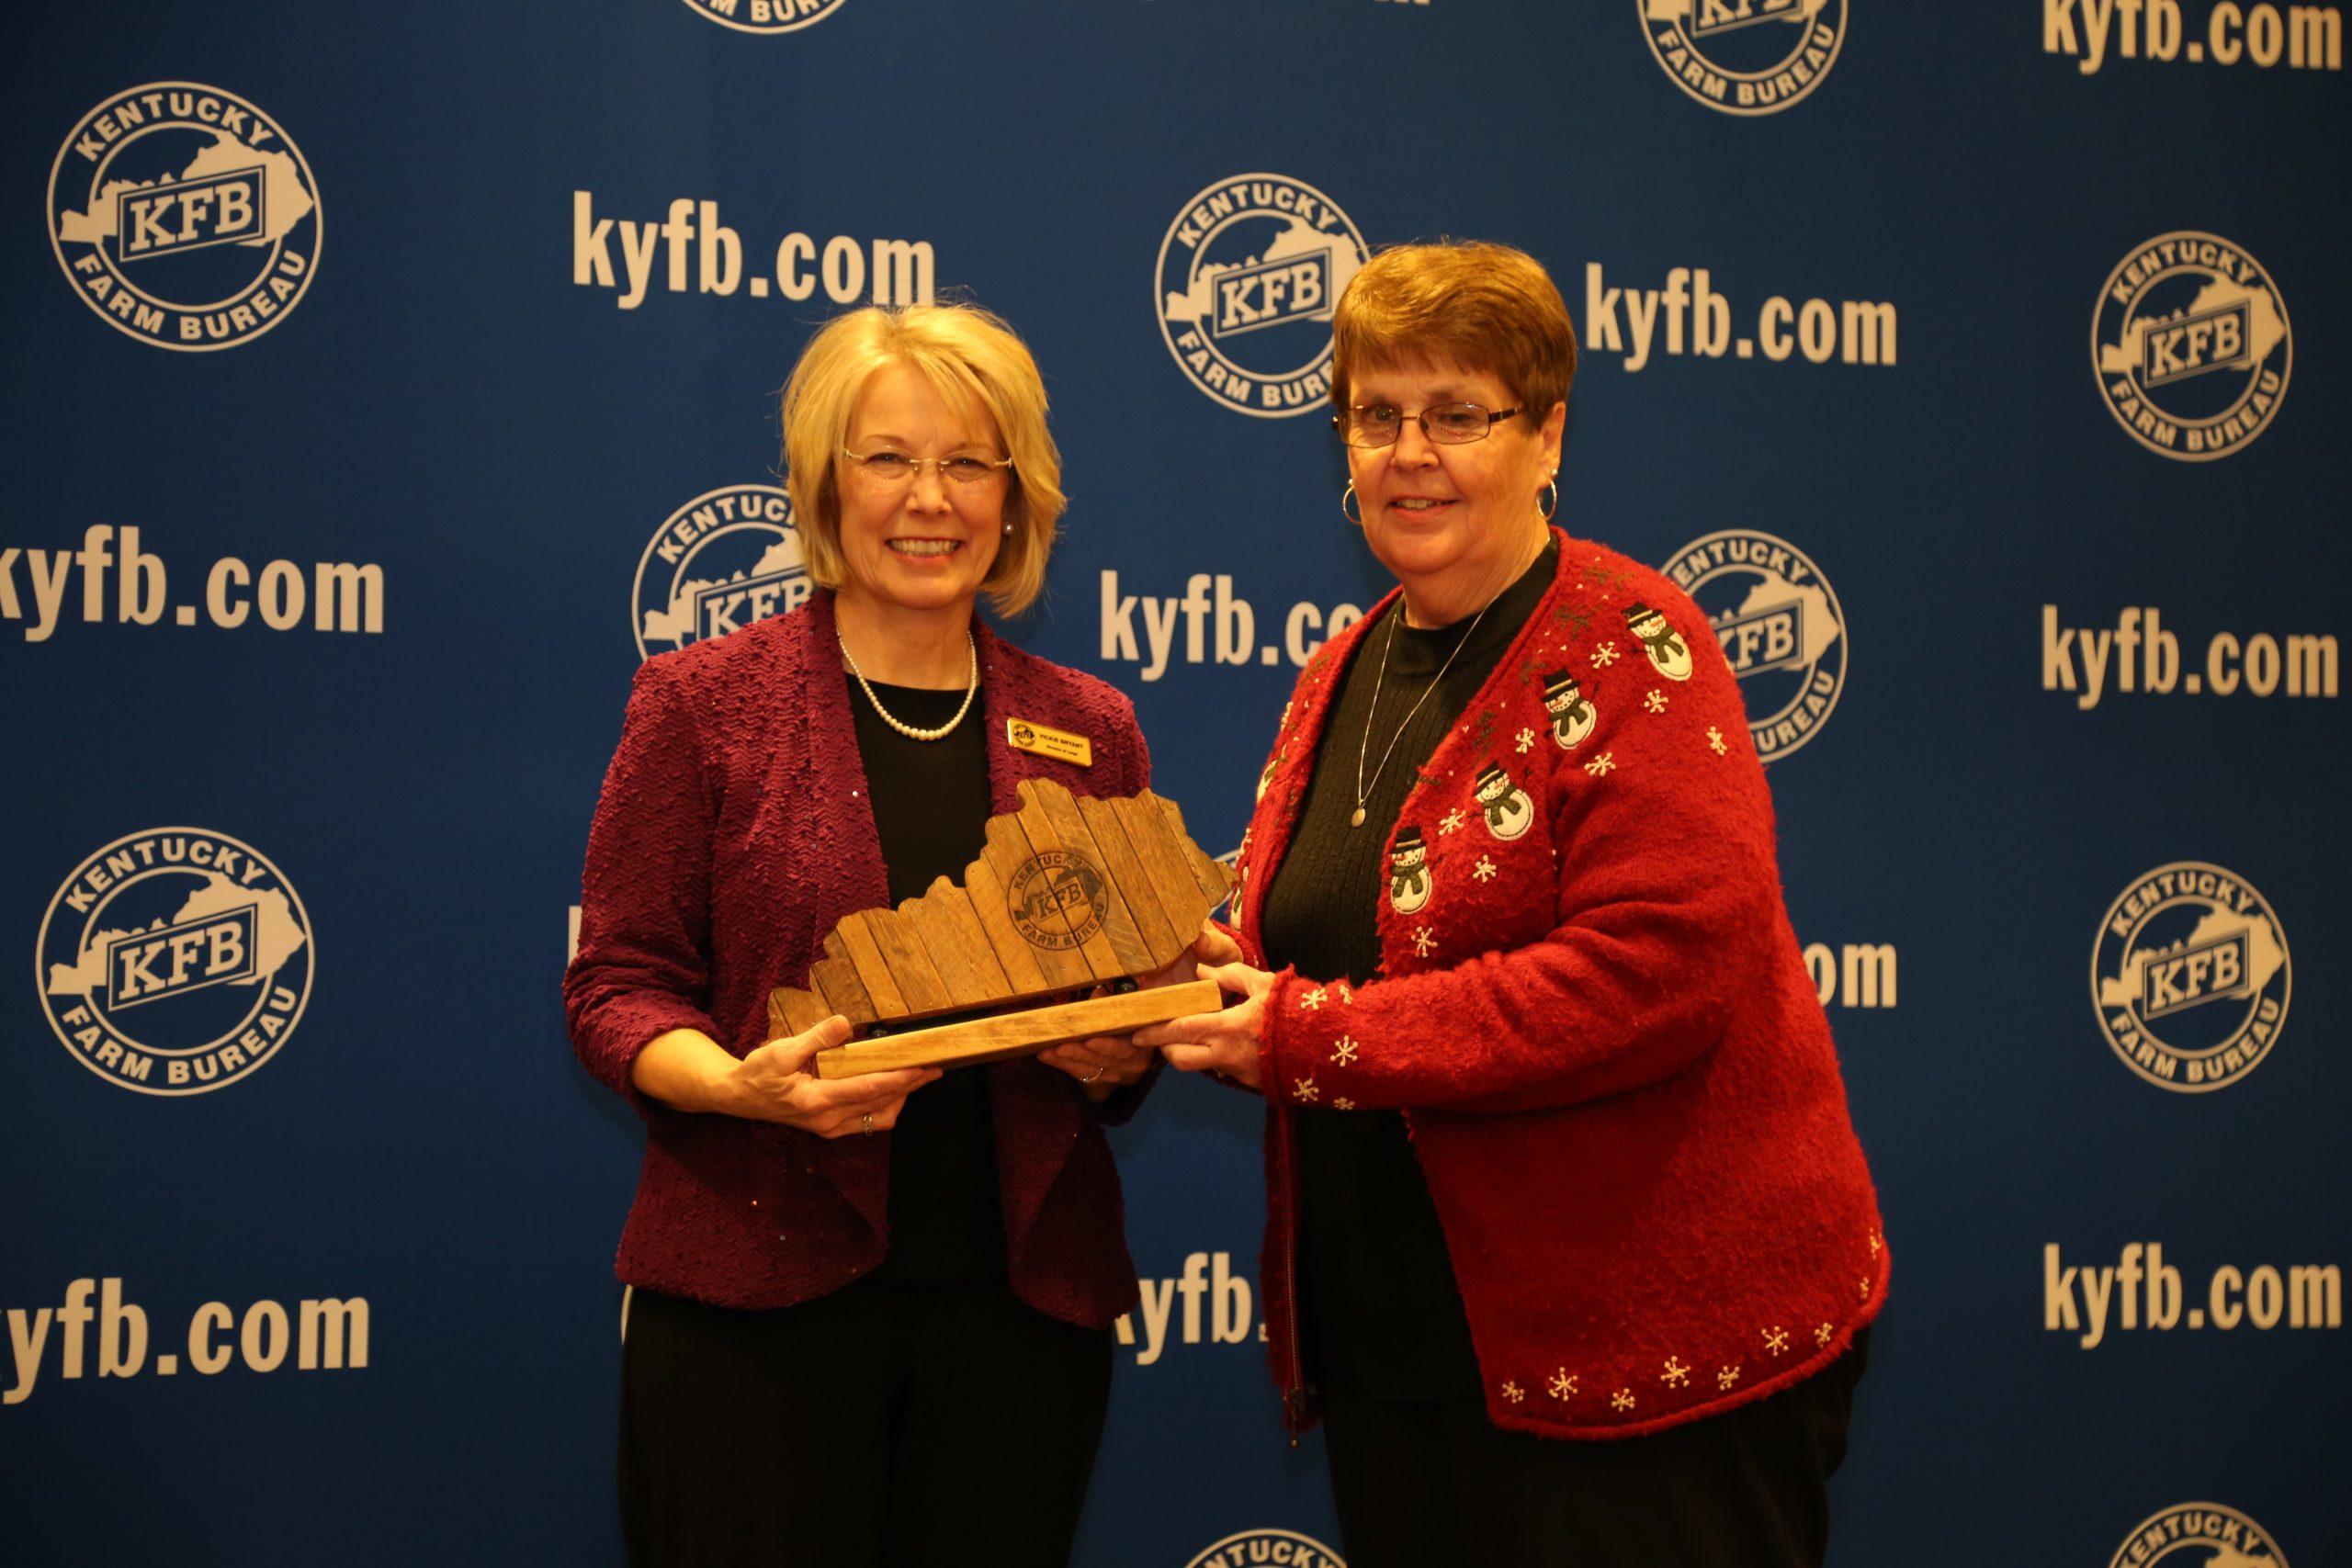 Christian Co. Farm Bureau receives award